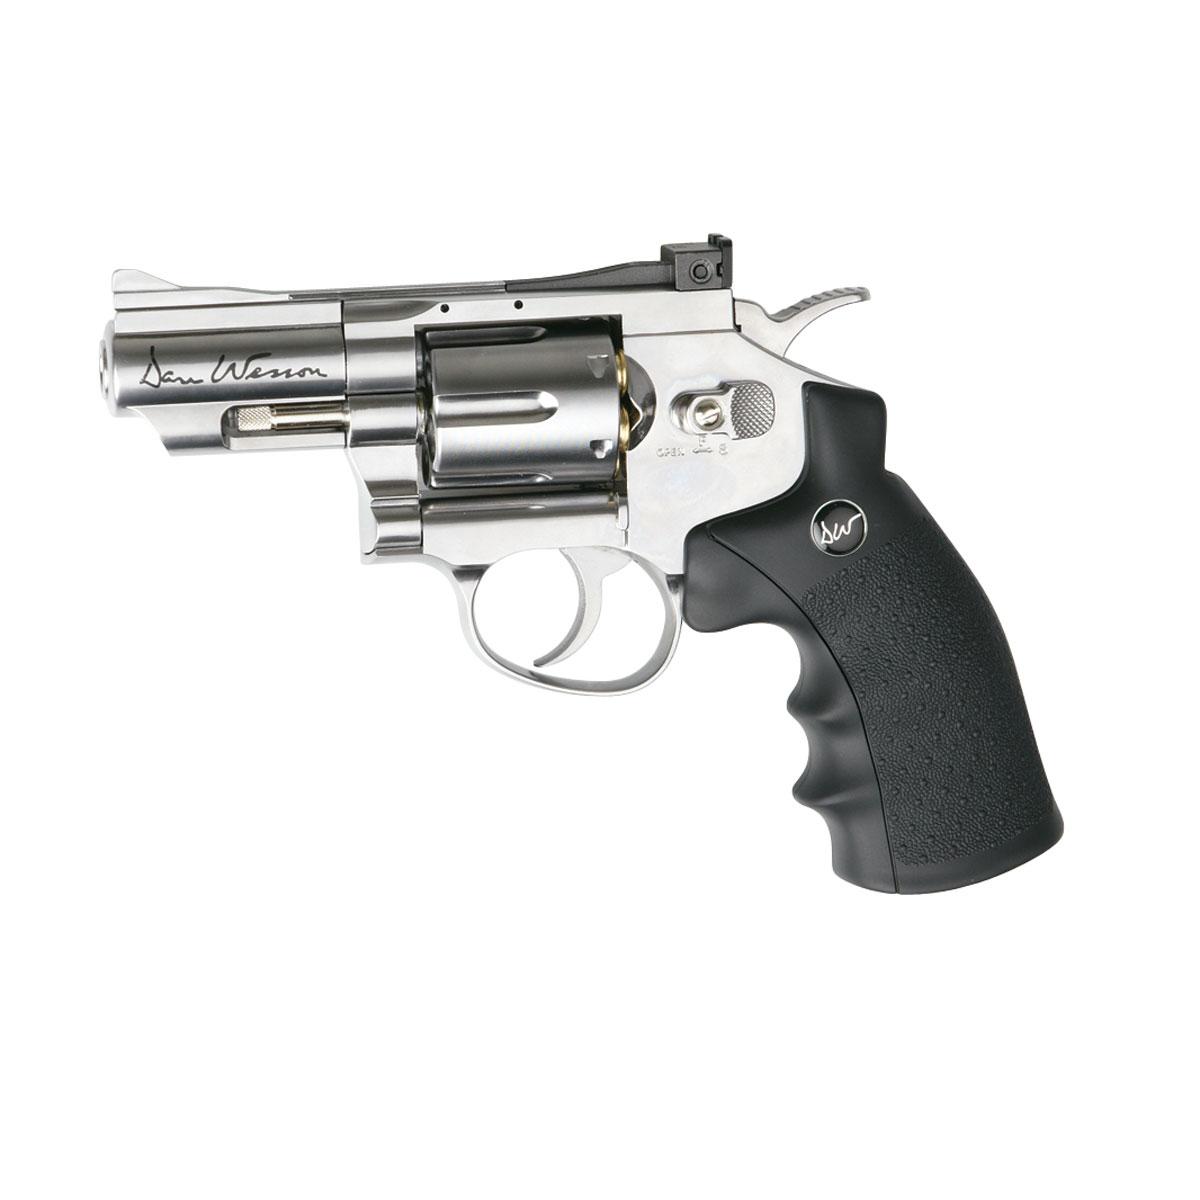 "ASG ASG ""Dan Wesson 2.5inch"" револьвер пневматический CO2, 4,5 мм, цвет: Silver (17177)"